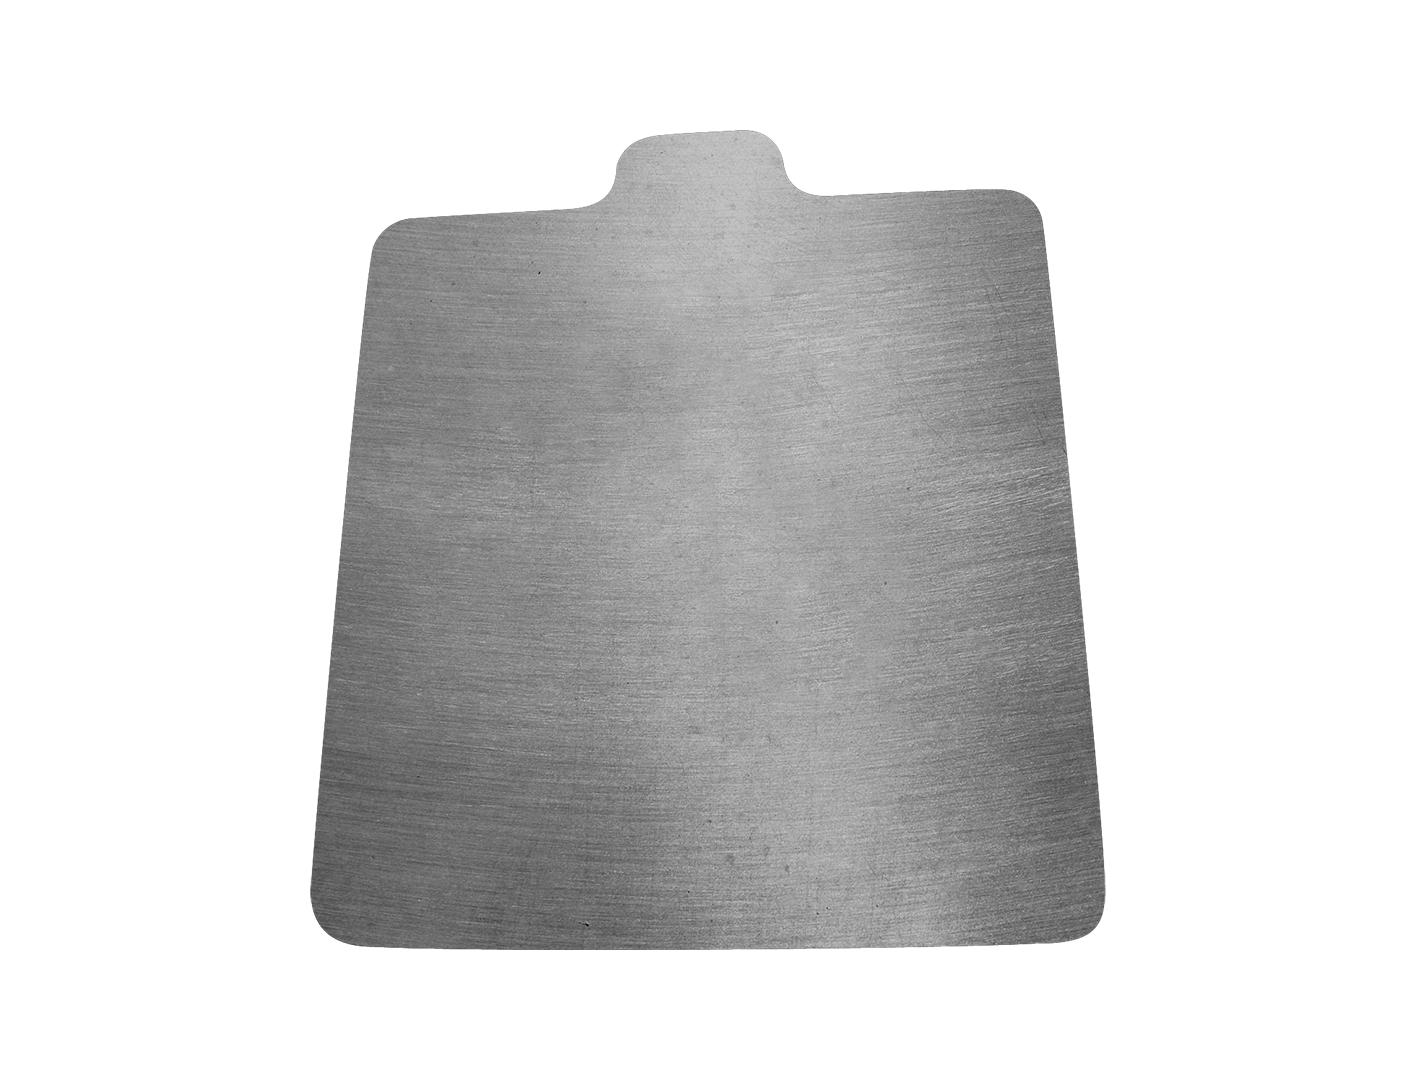 Aluminum_Web_icon